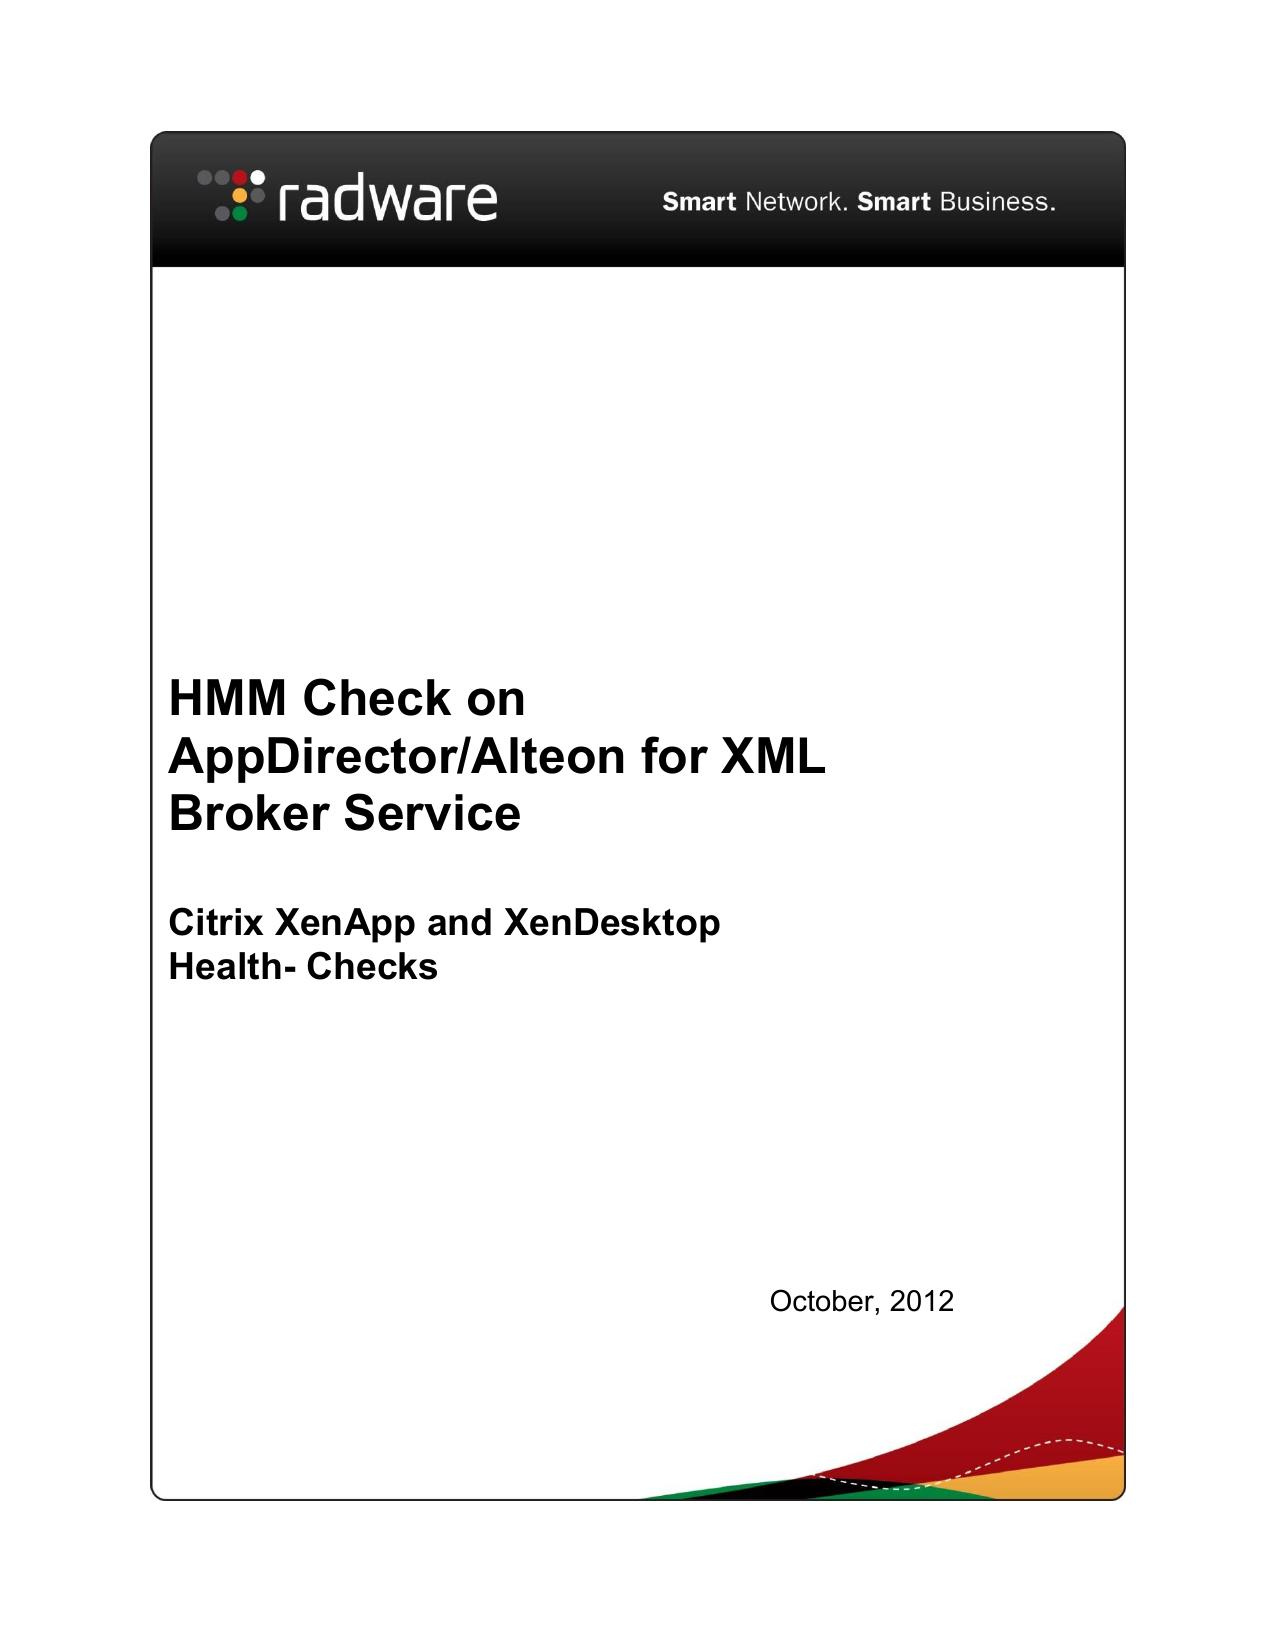 Citrix XenApp and XenDesktop Health-Checks | manualzz com